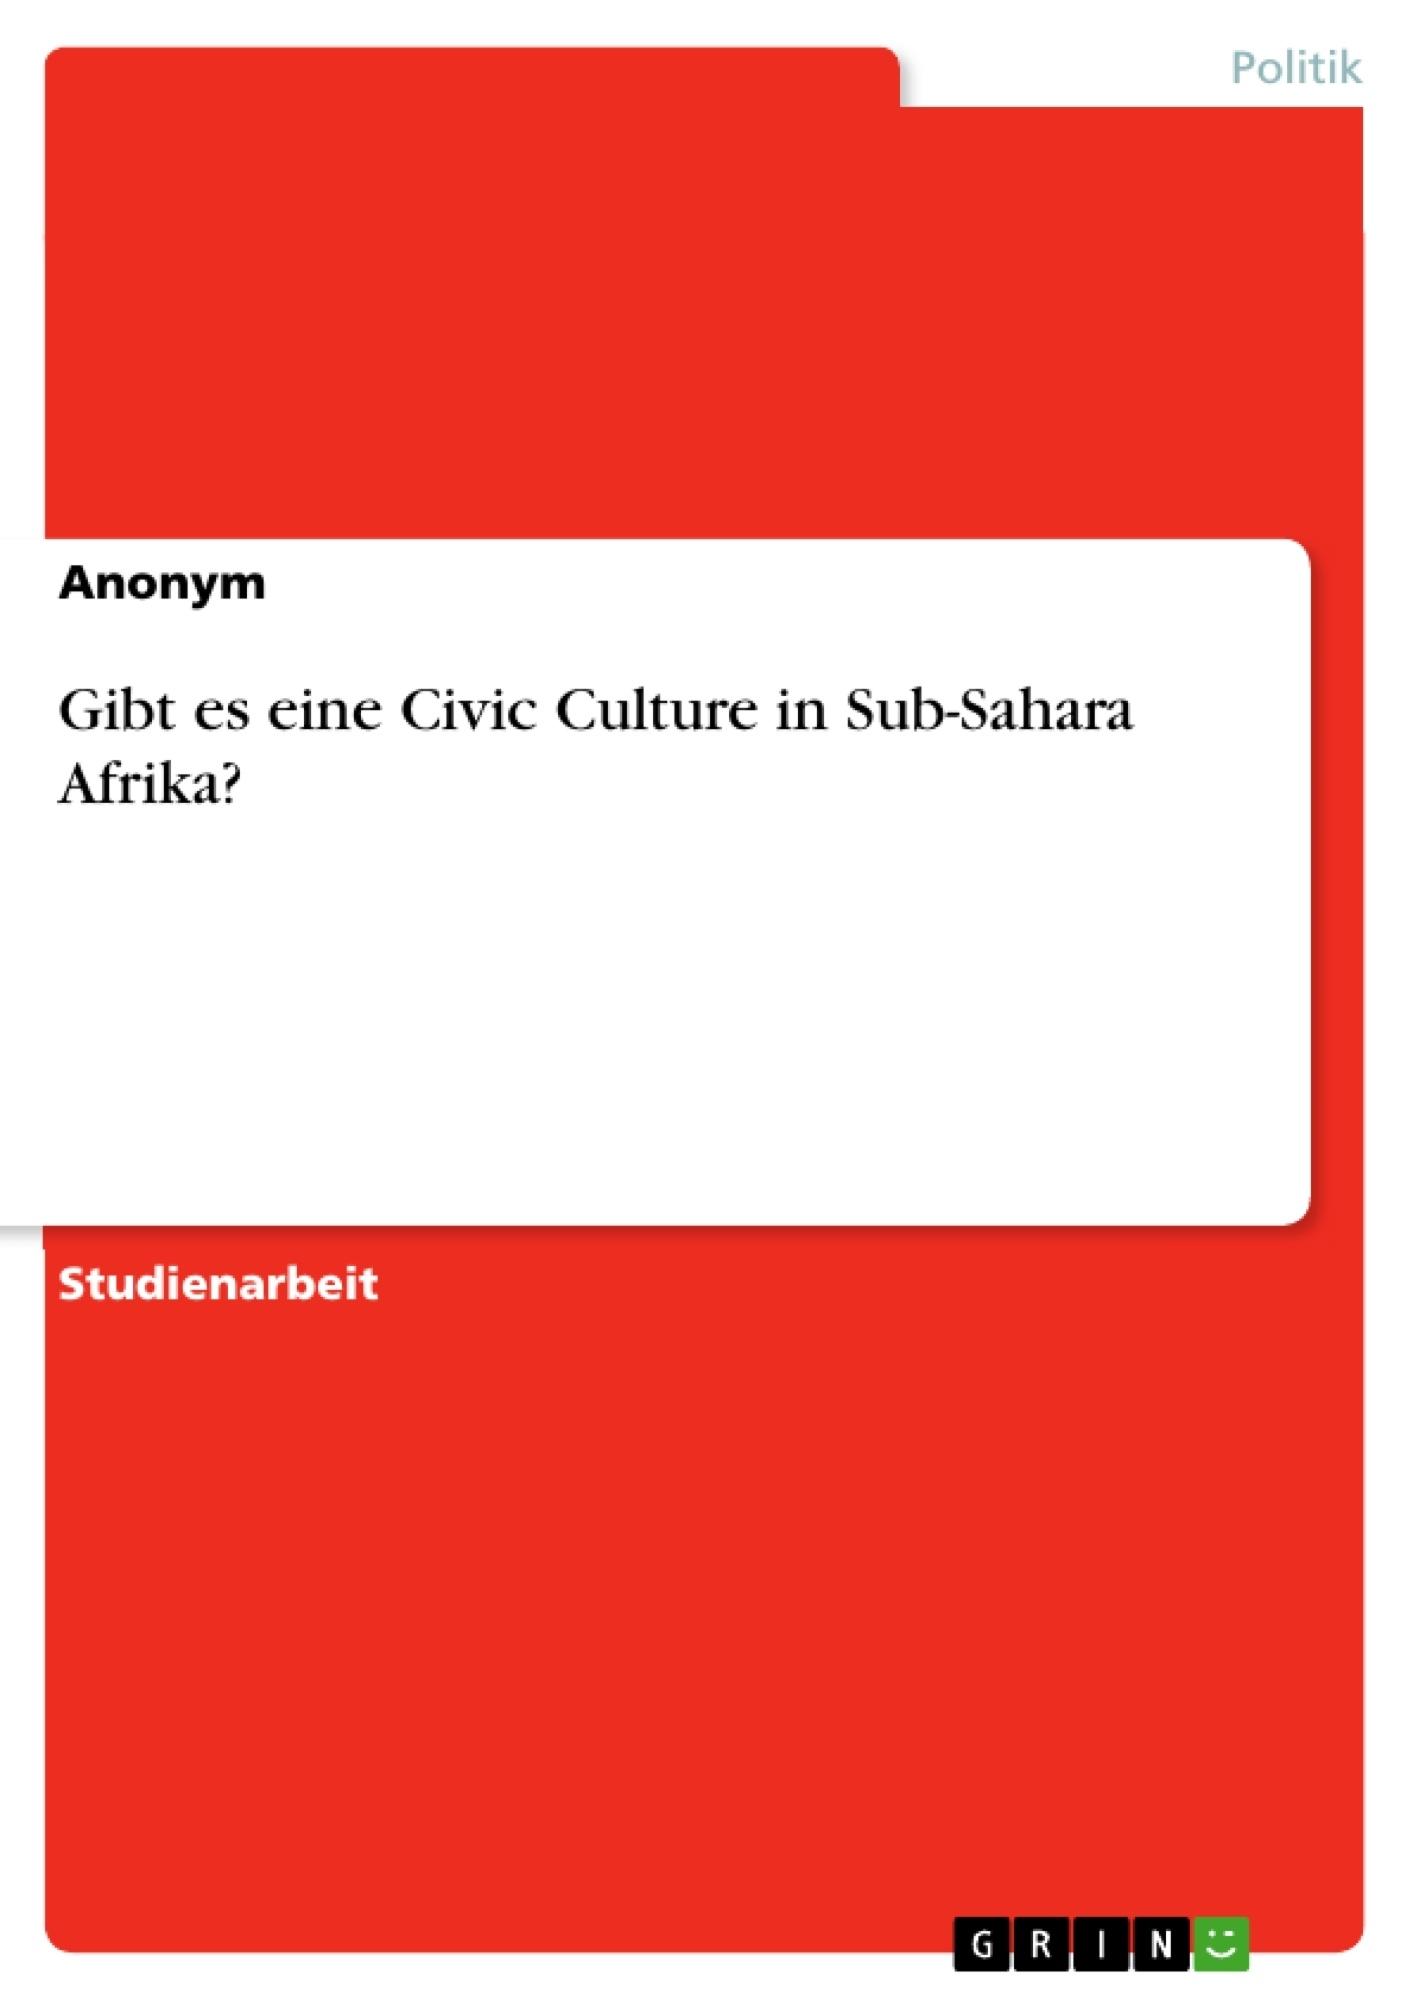 Titel: Gibt es eine Civic Culture in Sub-Sahara Afrika?